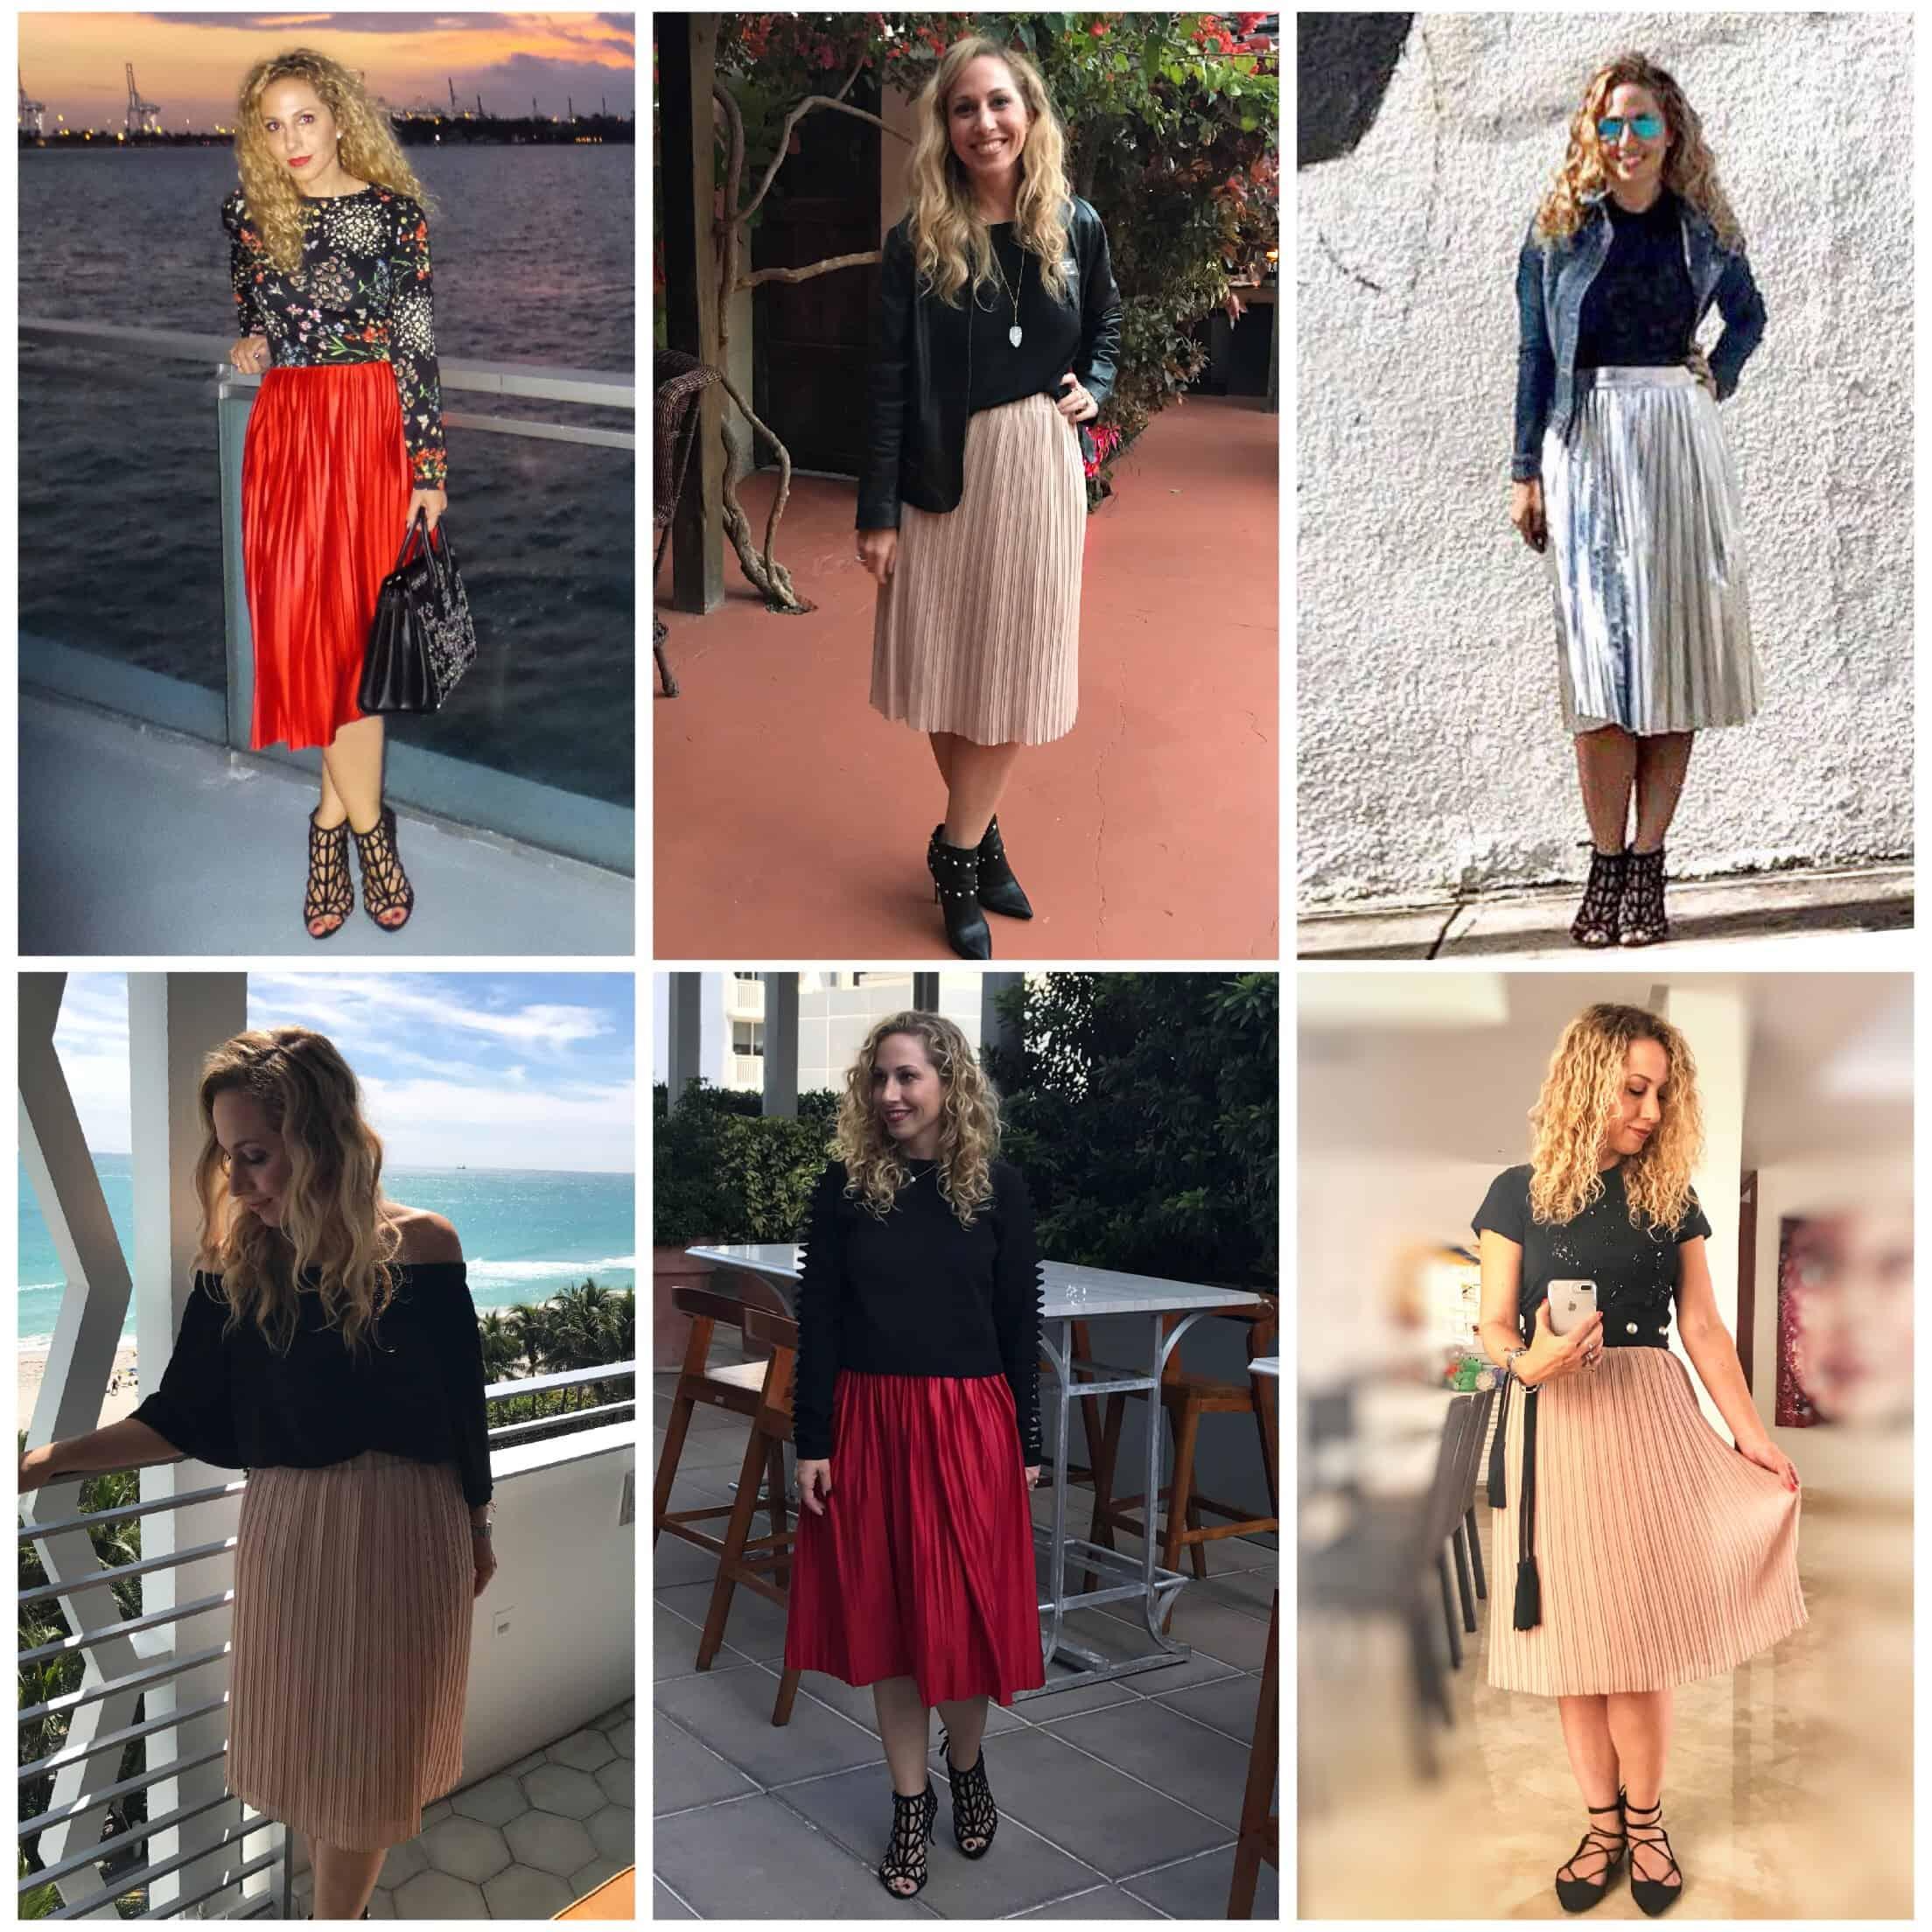 14c8dcc92 5 maneras de usar una falda midi plisada - Hispana Global